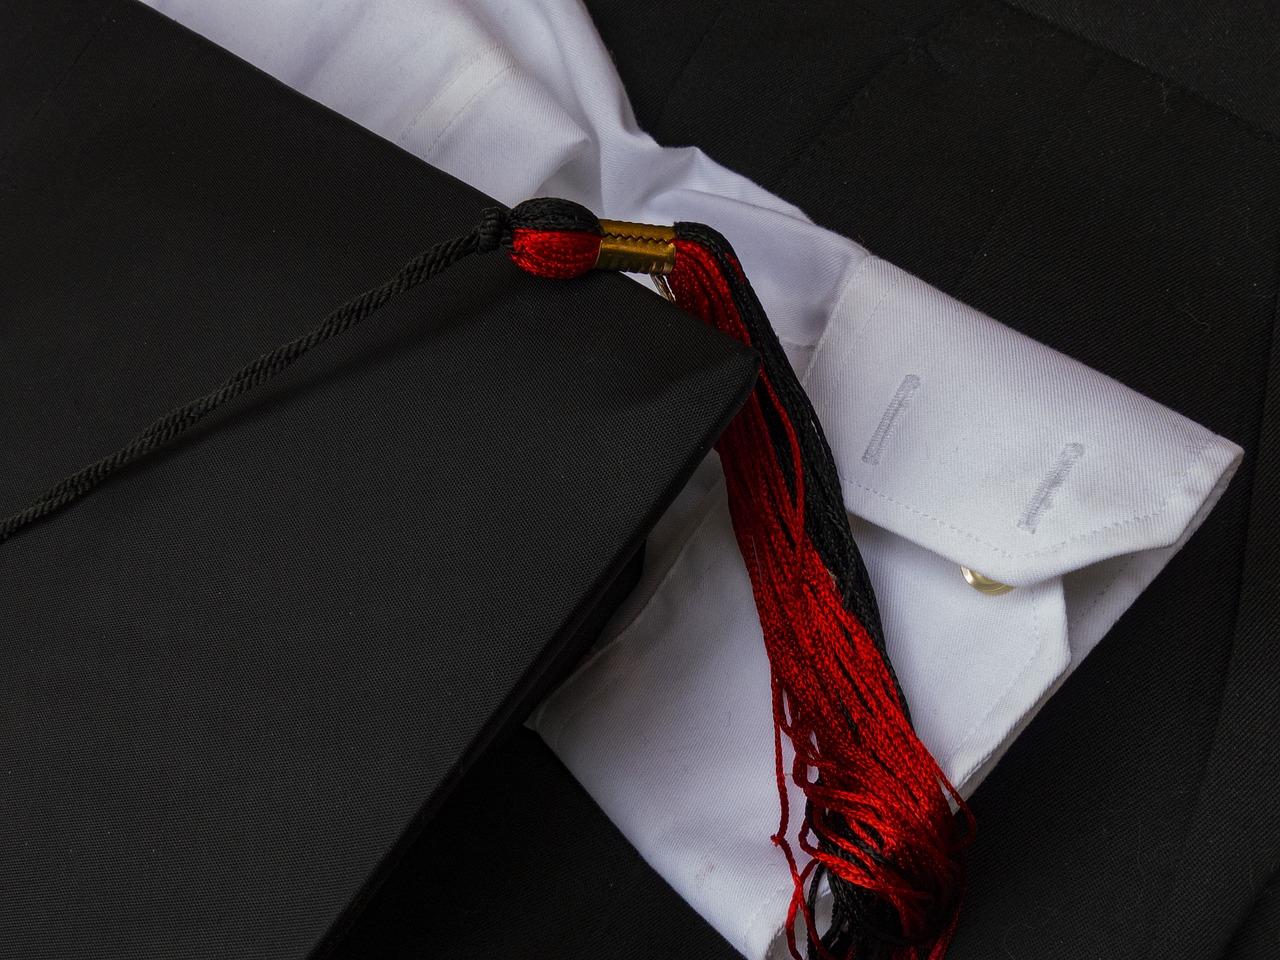 ESAMI ABILITAZIONE PROFESSIONE FORENSE 2020-2021